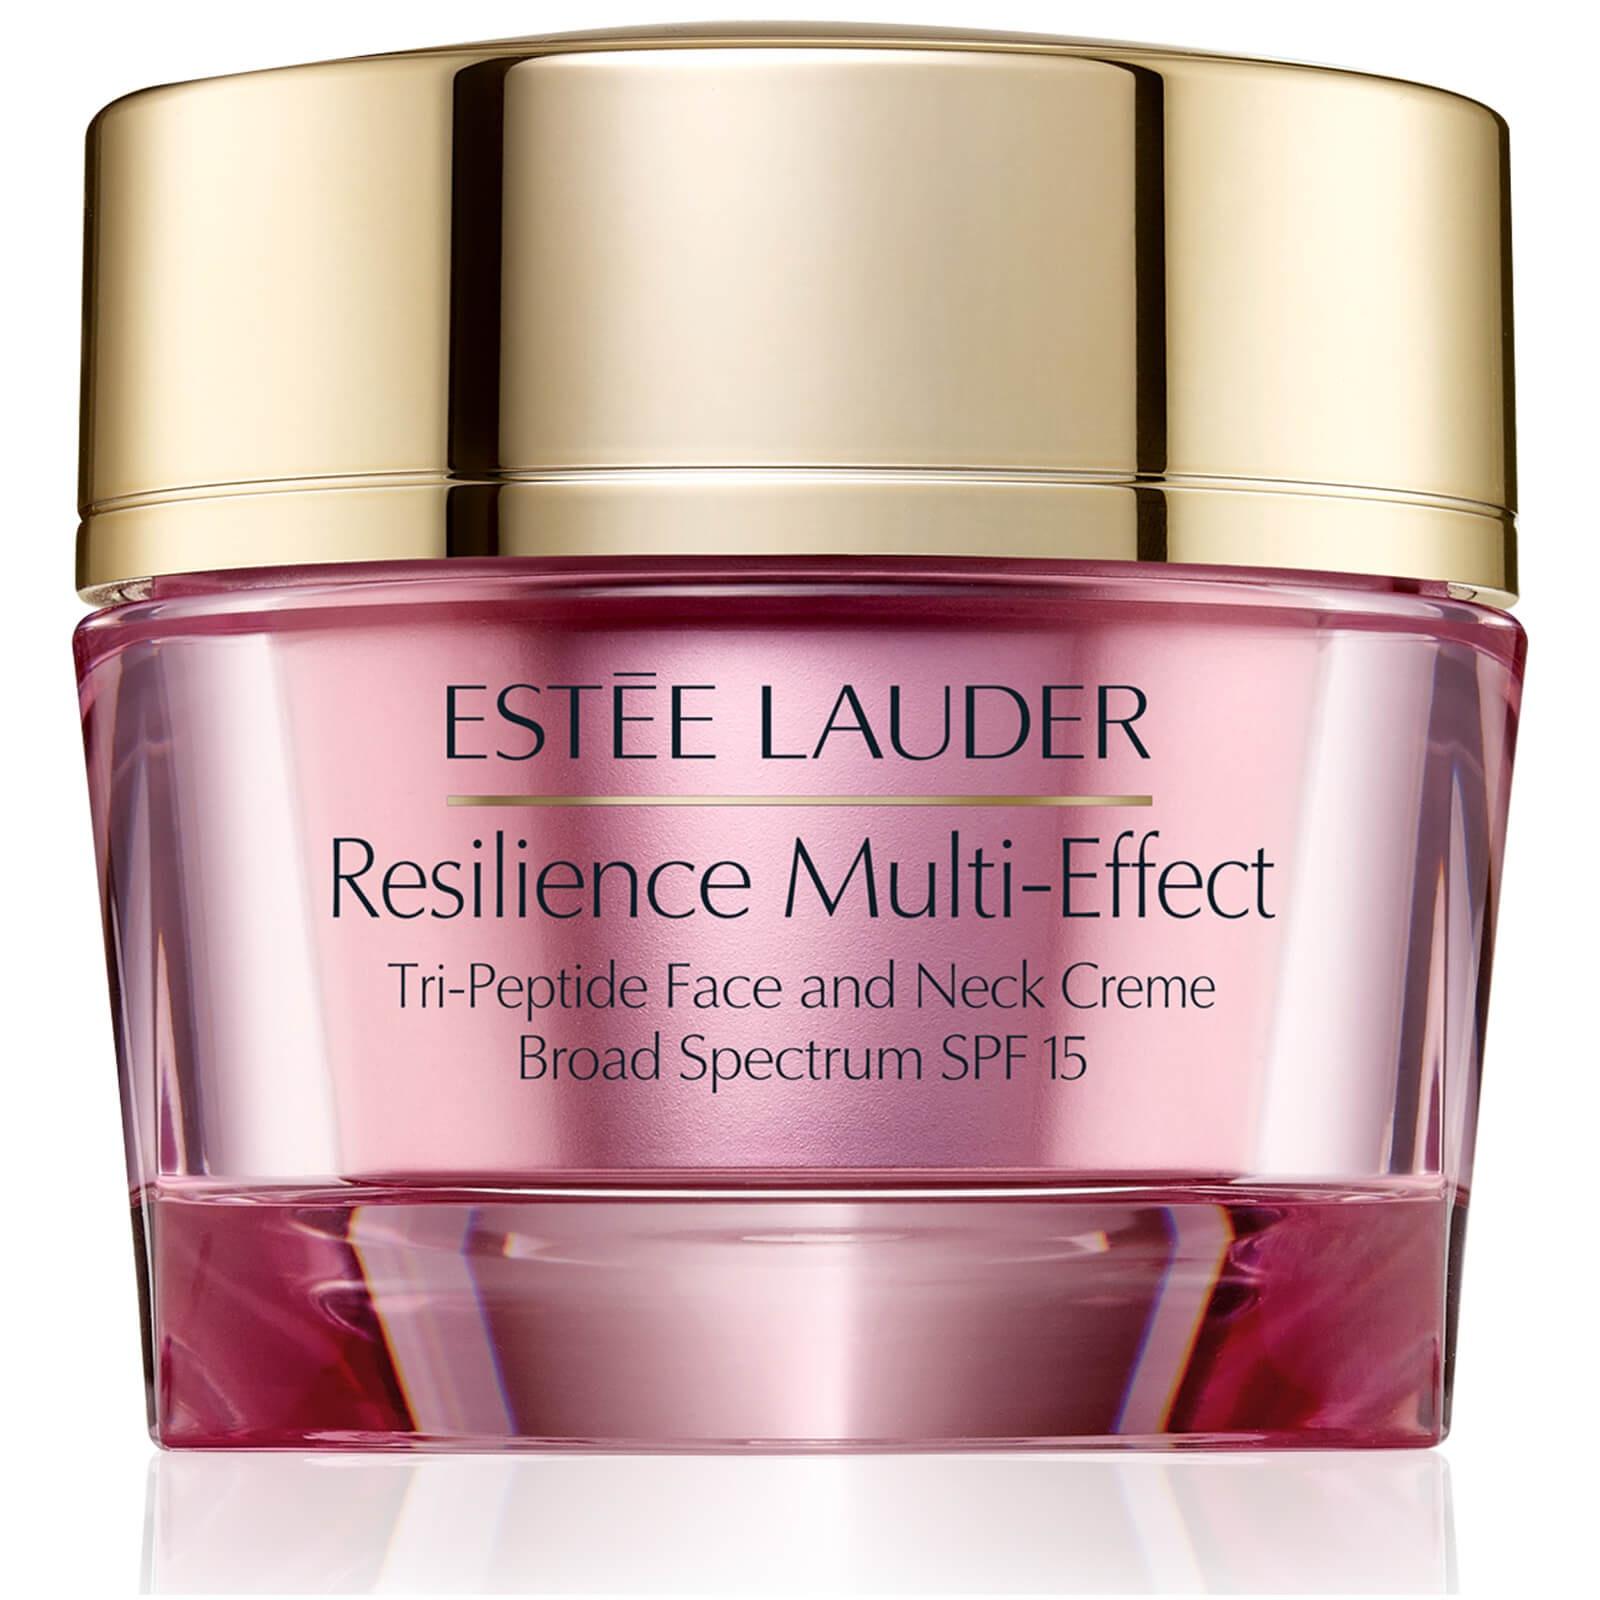 Estée Lauder Resilience Multi-Effect Tri-Peptide Face And Neck Creme SPF 15